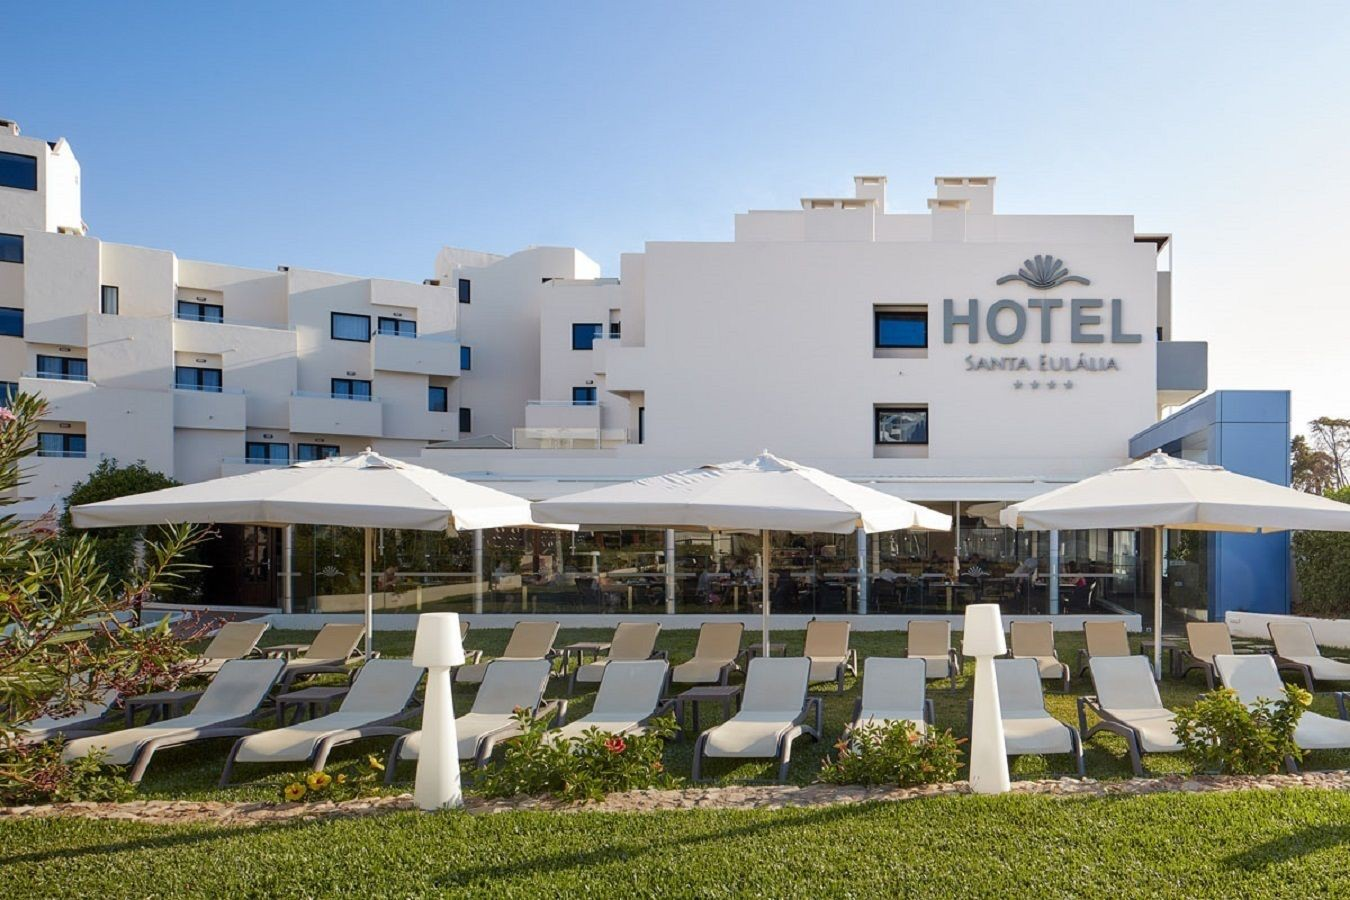 Courtesy of Santa Eulalia Hotel Apartamento & Spa / Expedia